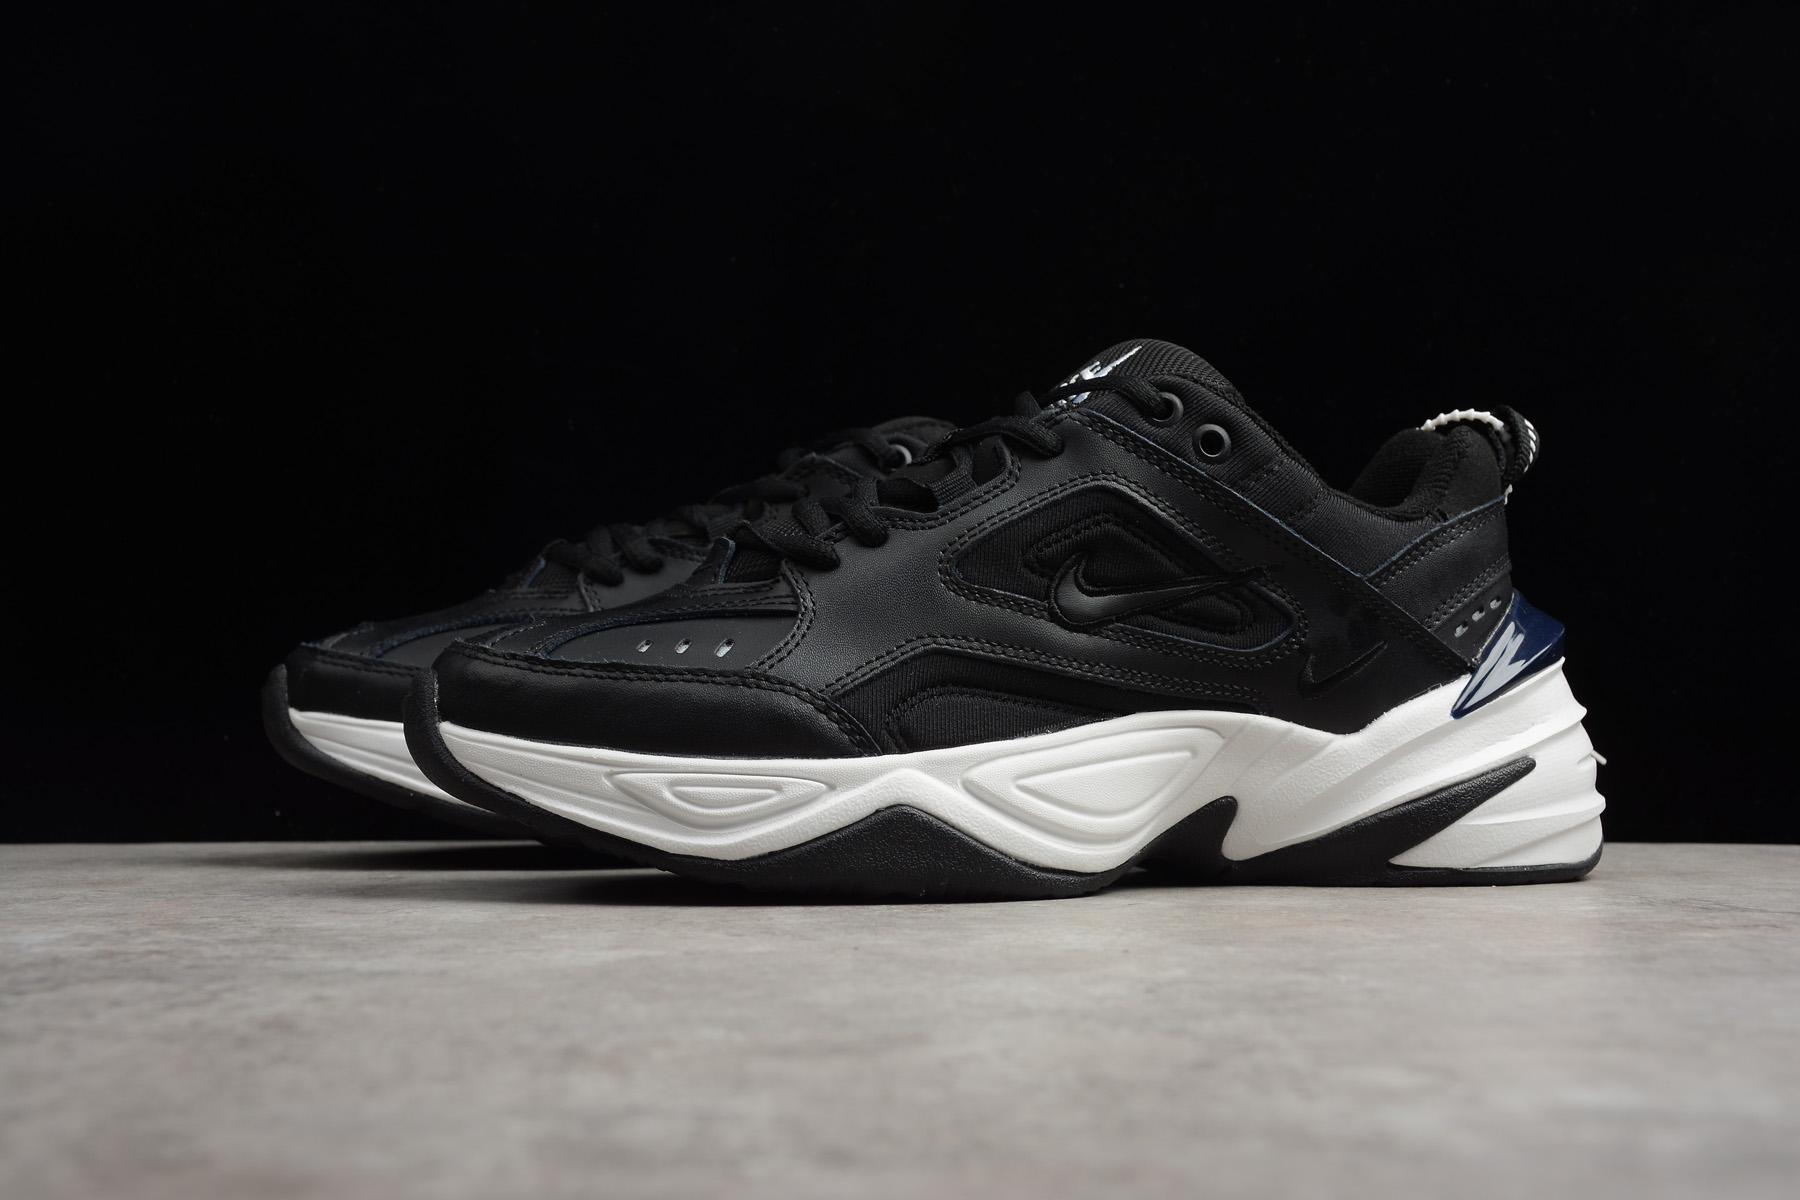 Nike M2K Tekno Black/Off White,Obsidian Dad Shoes AO3108,003